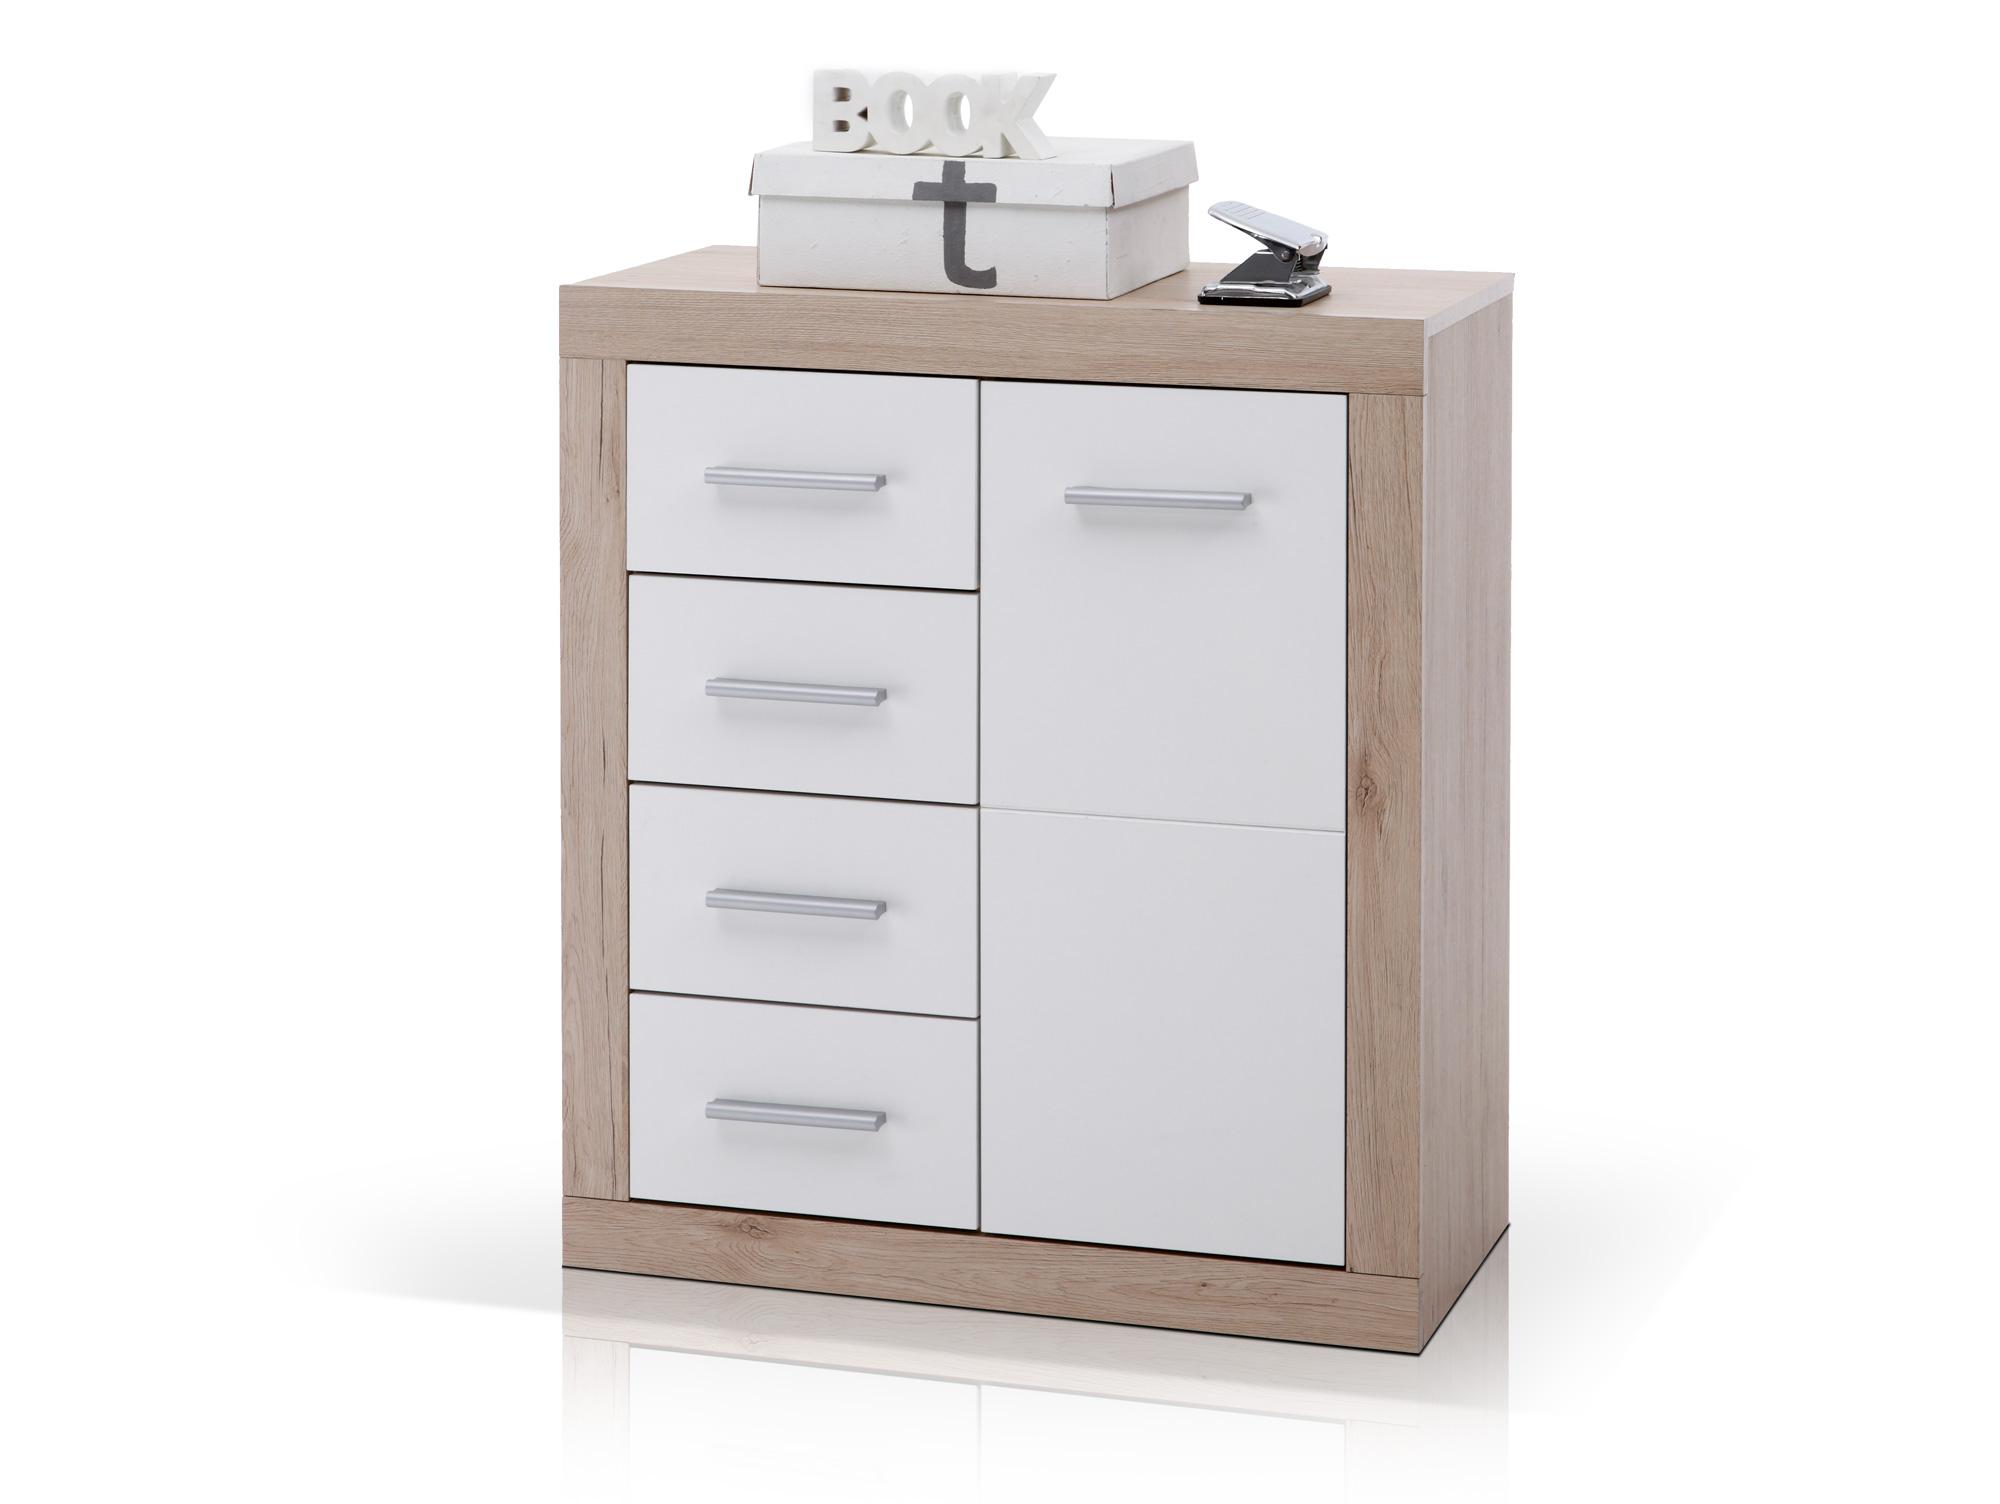 chester kommode b6 1 t r 4 sk san remo wei. Black Bedroom Furniture Sets. Home Design Ideas